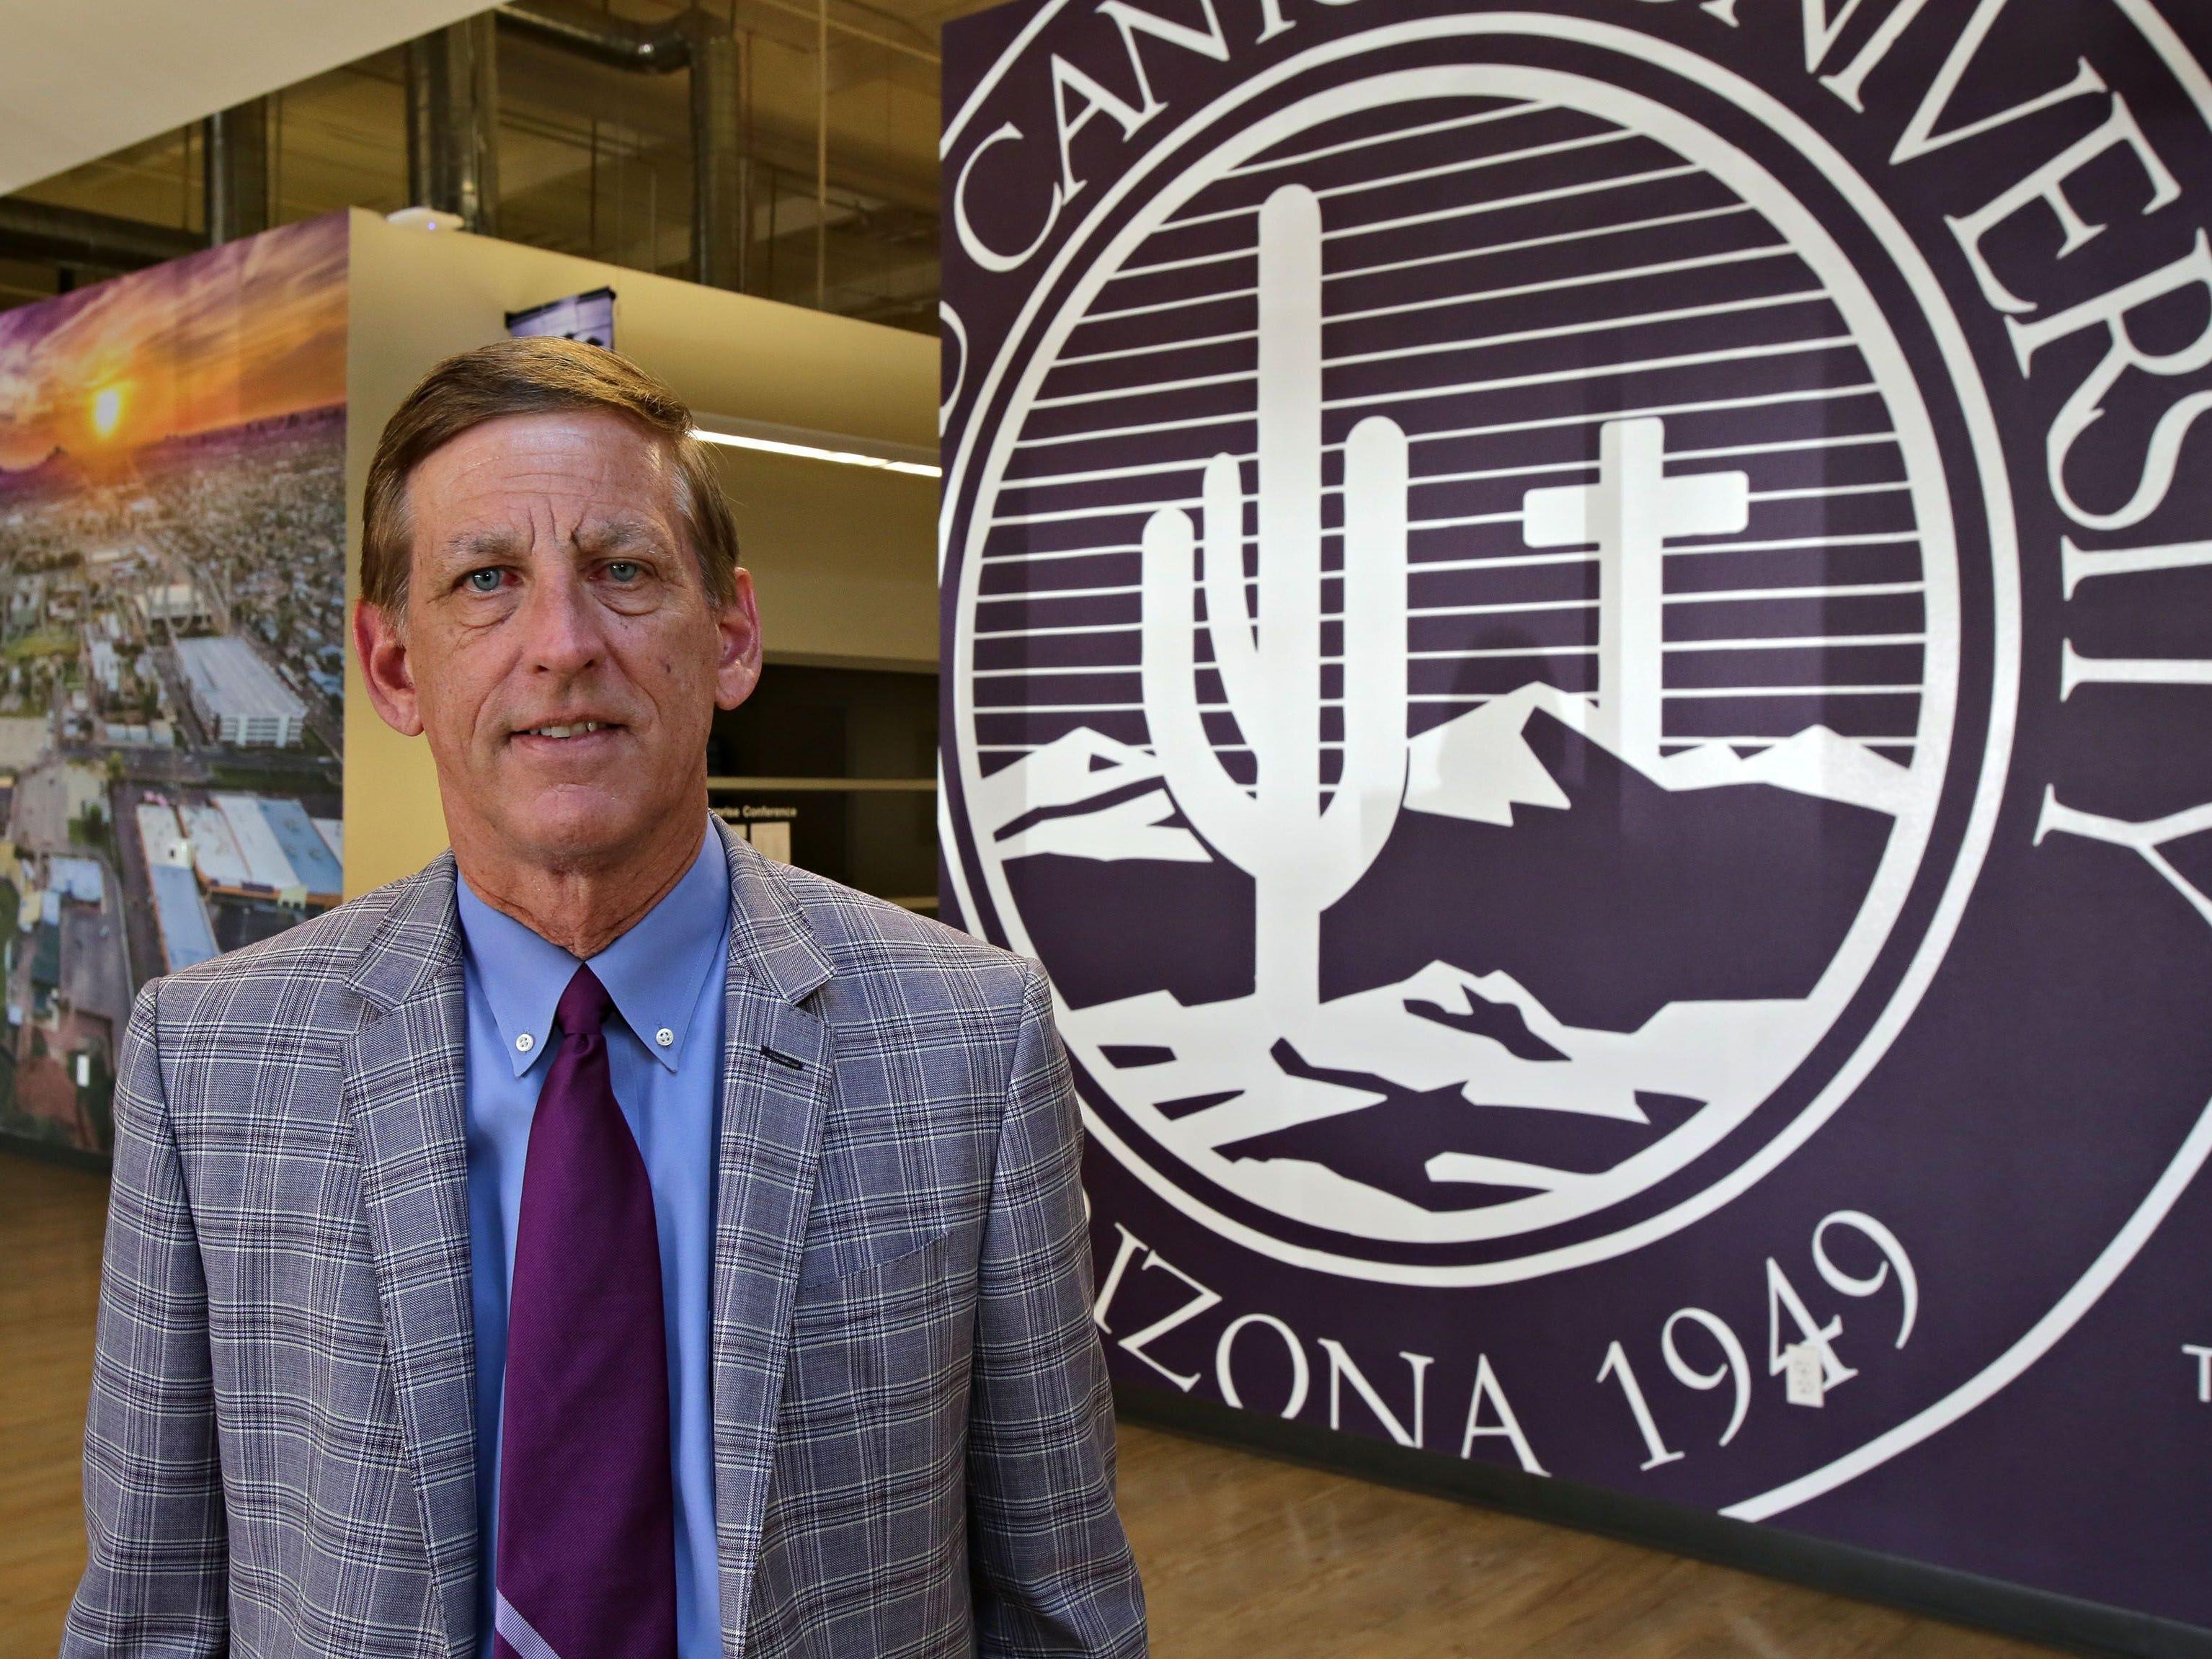 Grand Canyon Education Inc.'s Brian Mueller: Summary compensation: $2,799,914. Adjusted compensation: $16,755,583. TTM profit: $221 million. TTM revenue: $1 billion. 2017 stock: 53.2 percent. Capitalization: $5.7 billion.